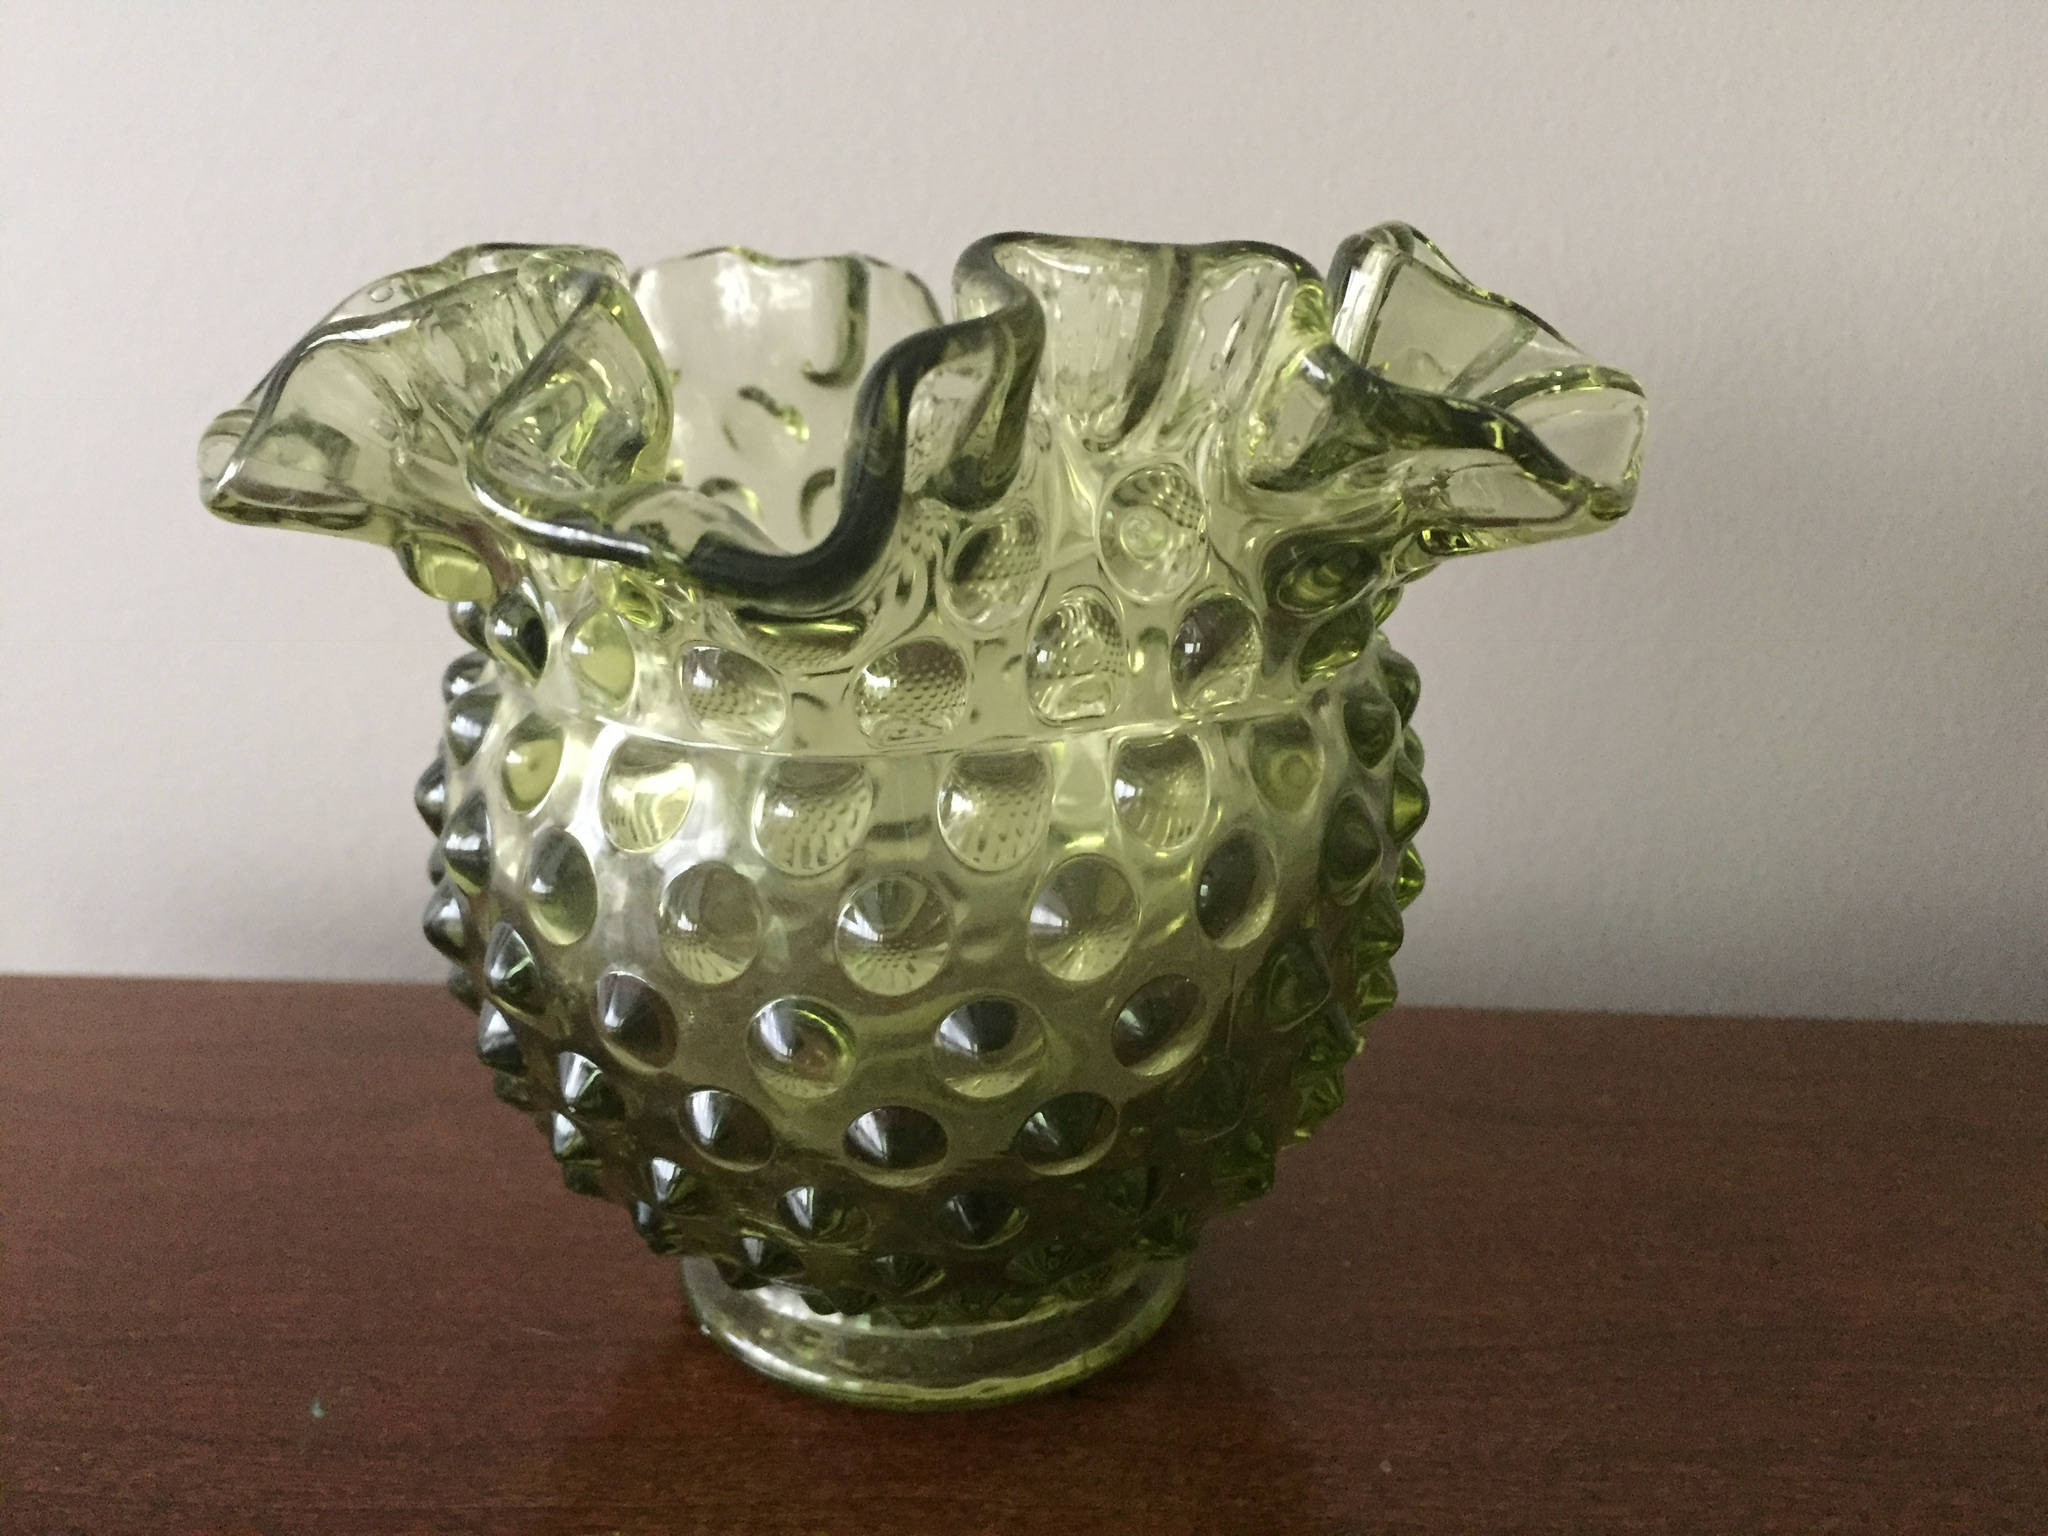 23 Best Hobnail Vase Pink 2021 free download hobnail vase pink of vintage fenton hobnail vase ruffle top green glassware etsy throughout dc29fc294c28ezoom